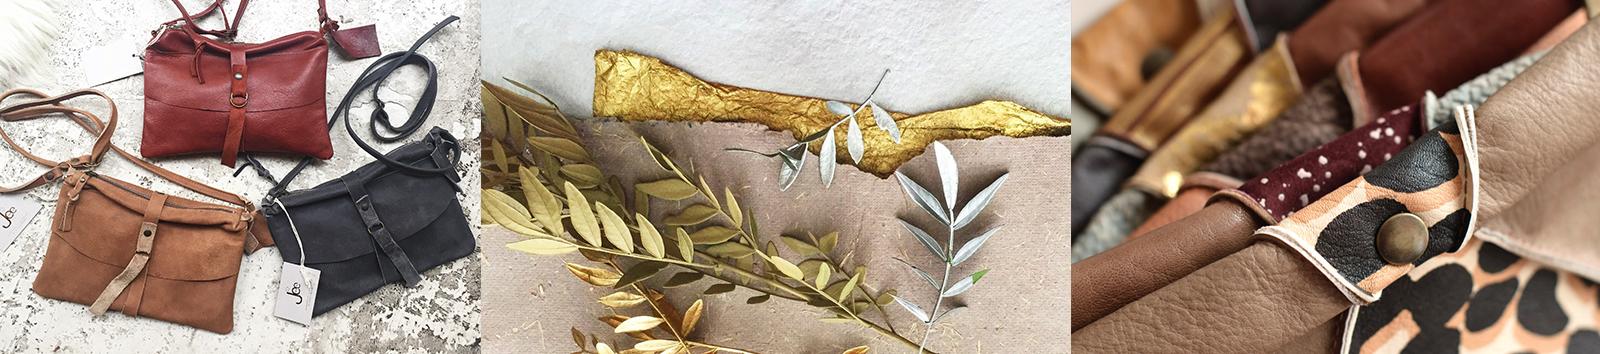 Terms & Conditions – Jee Bags, unique handmade leather bags, unieke handgemaakte leren tassen, Janneke Peters